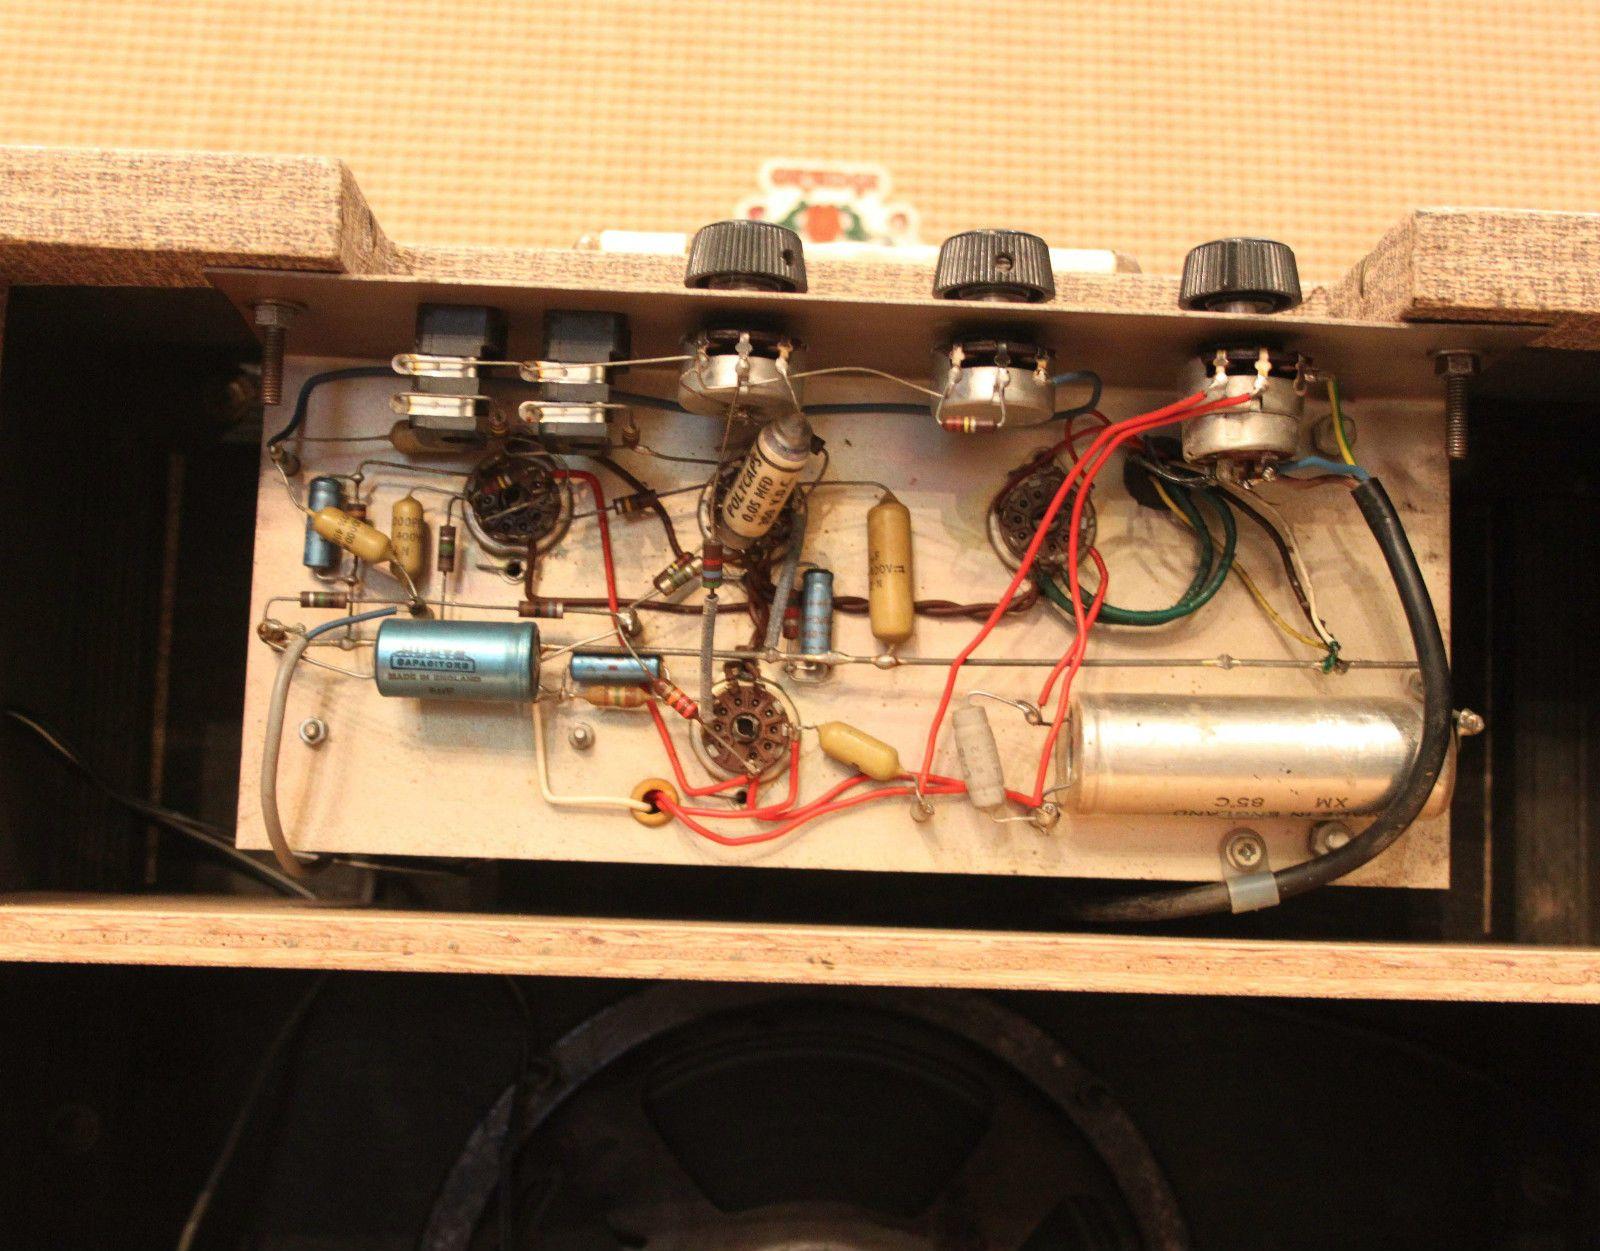 Vintage 1962 Vox AC4 Beige Fawn Tolex 1x8 Elac Valve Amp